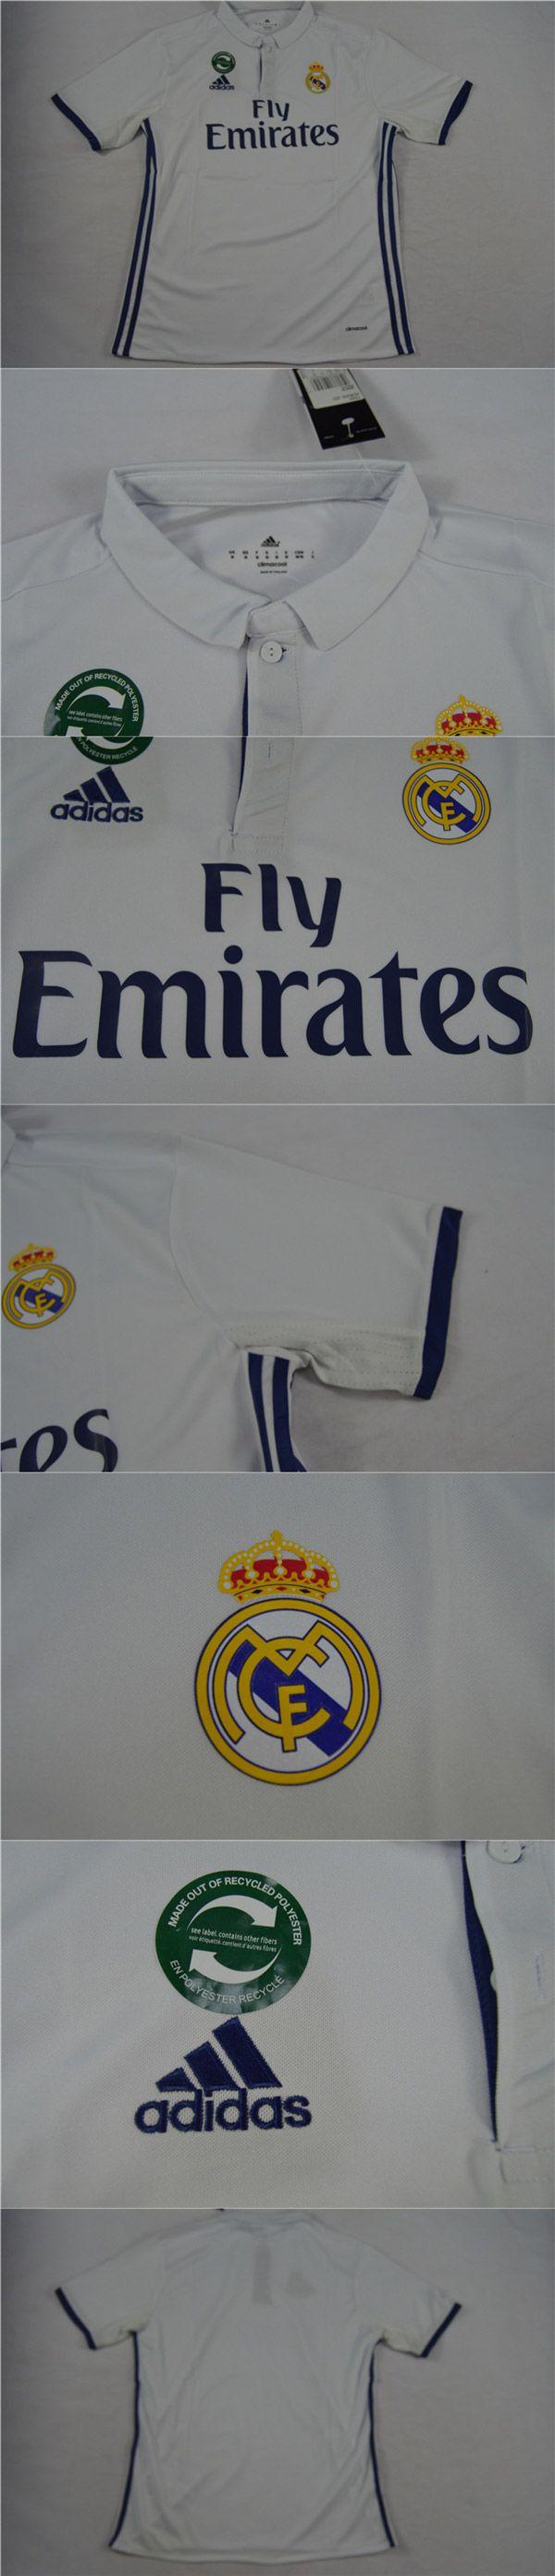 Cheap Soccer Jerseys Spanish Liga Real Madrid Home Soccer Jersey Shirt 2016-2017   www.hotclubjersey.com